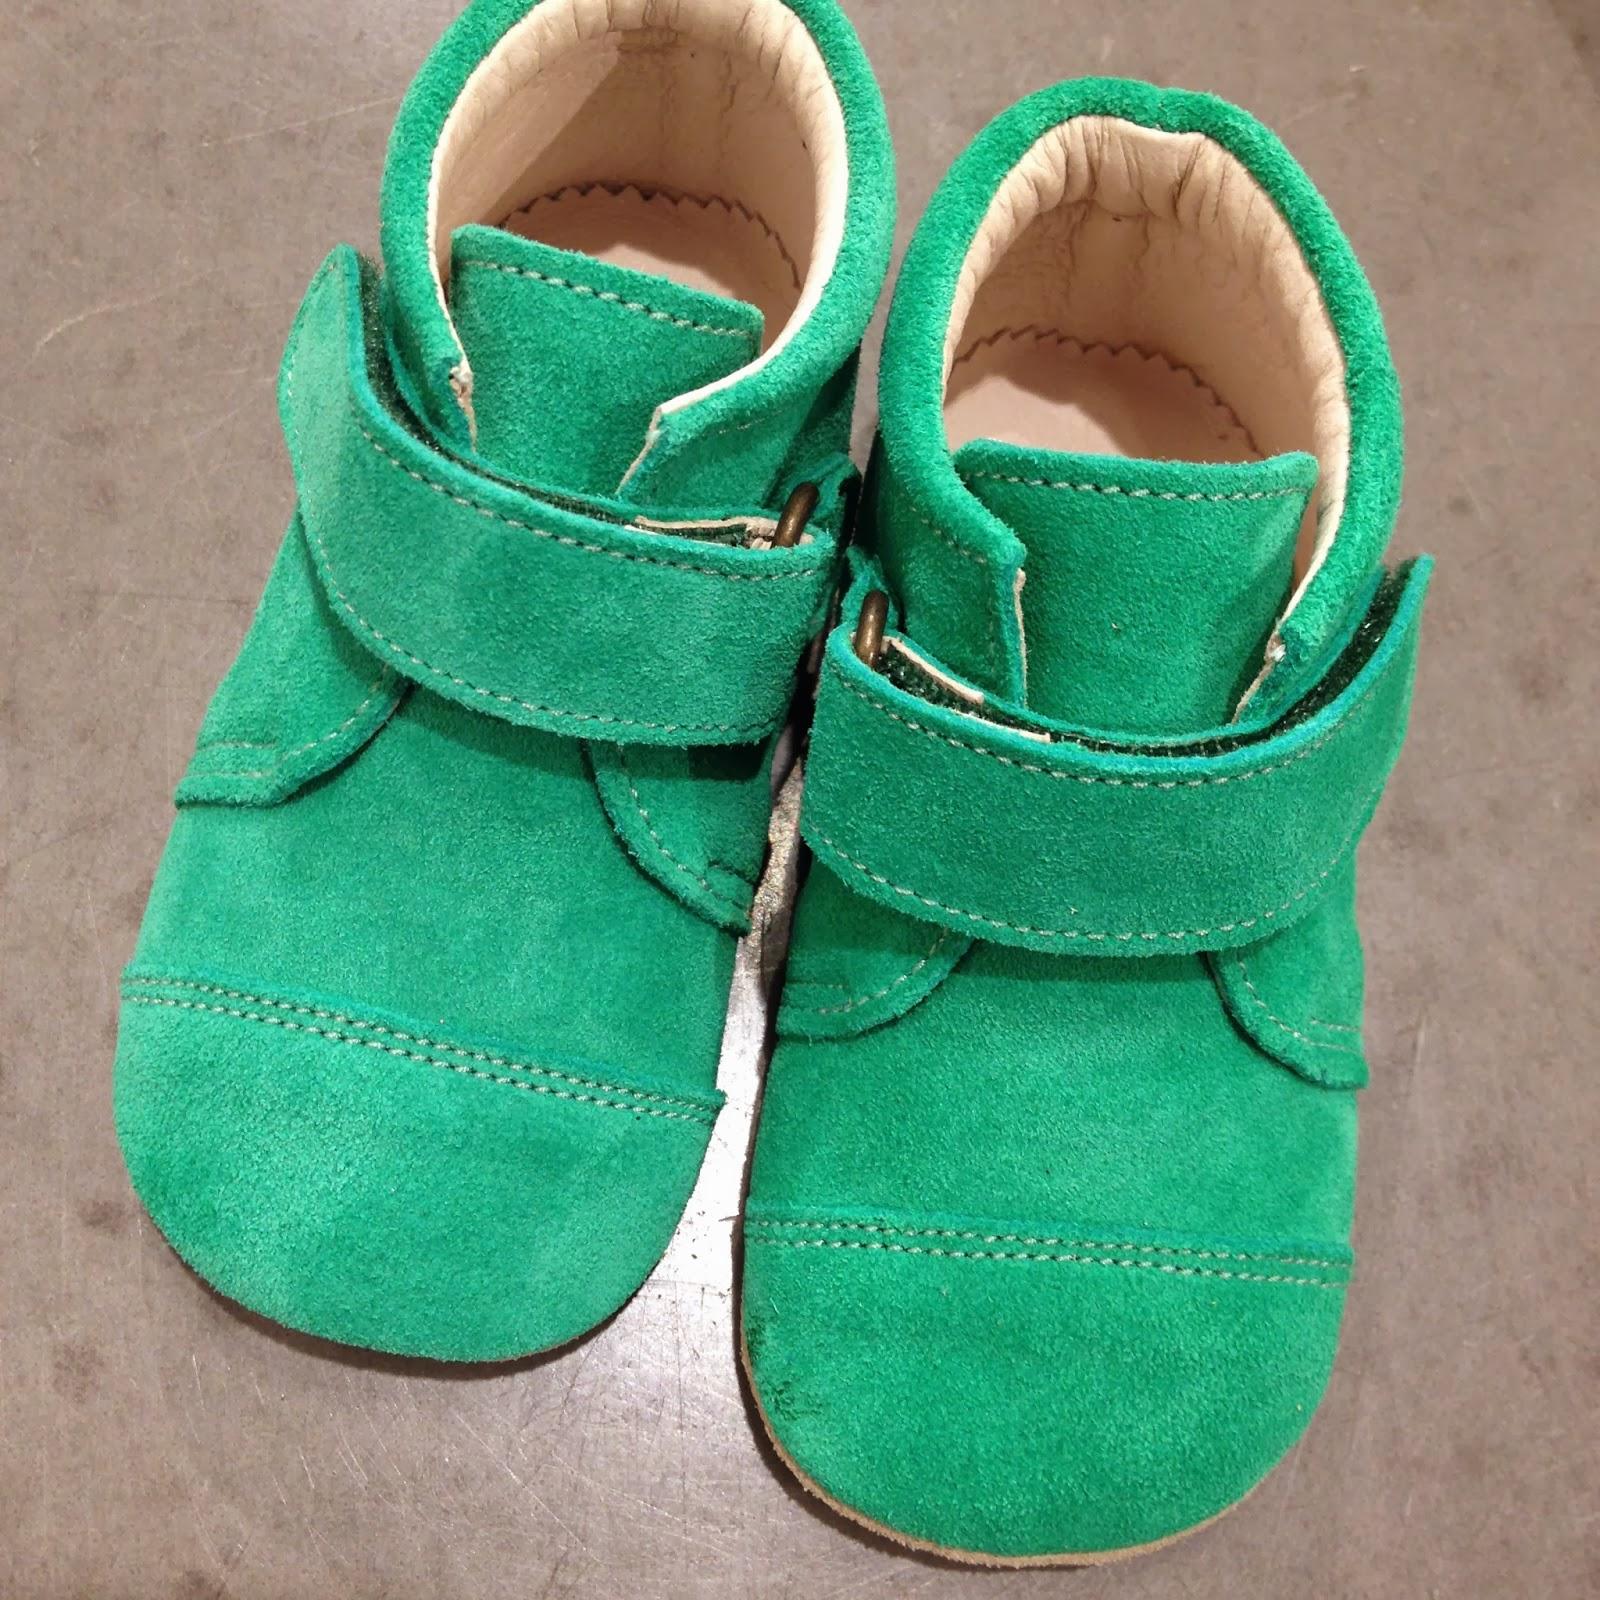 c6c6bbc0 Barna i gata: Lekre sko fra Petit Nord